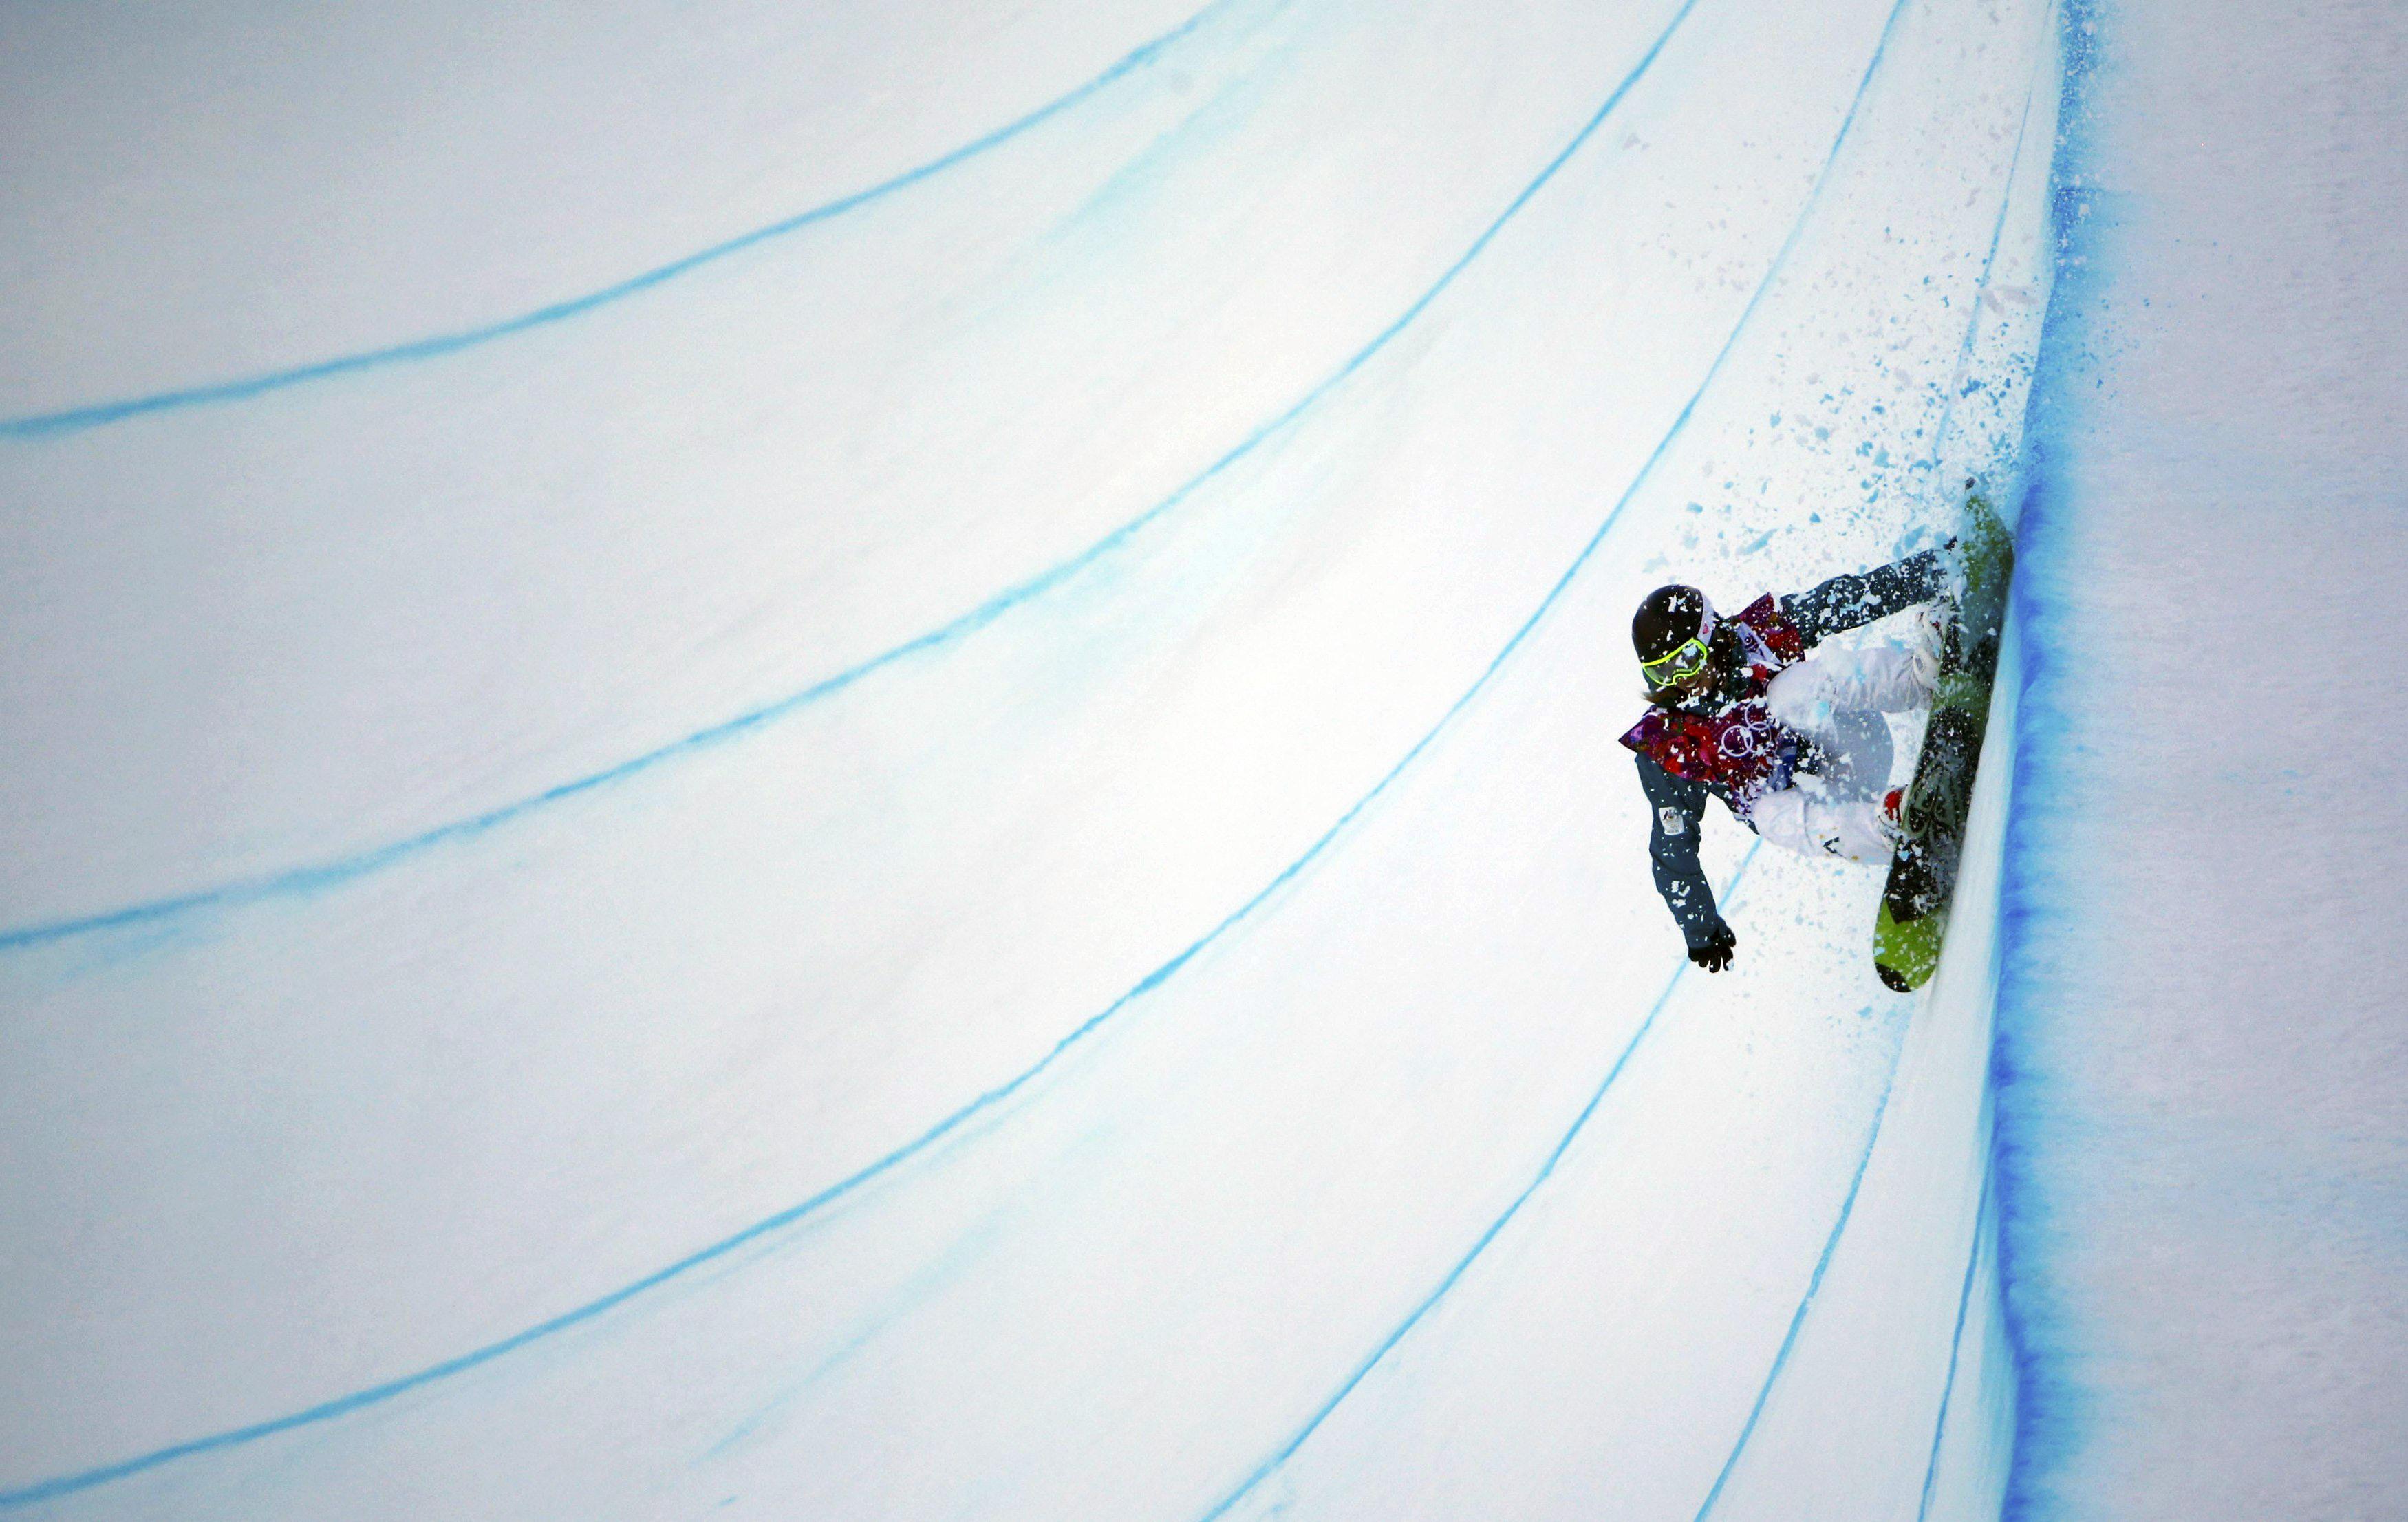 Australia's Torah Bright competes during the women's snowboard halfpipe qualification round.